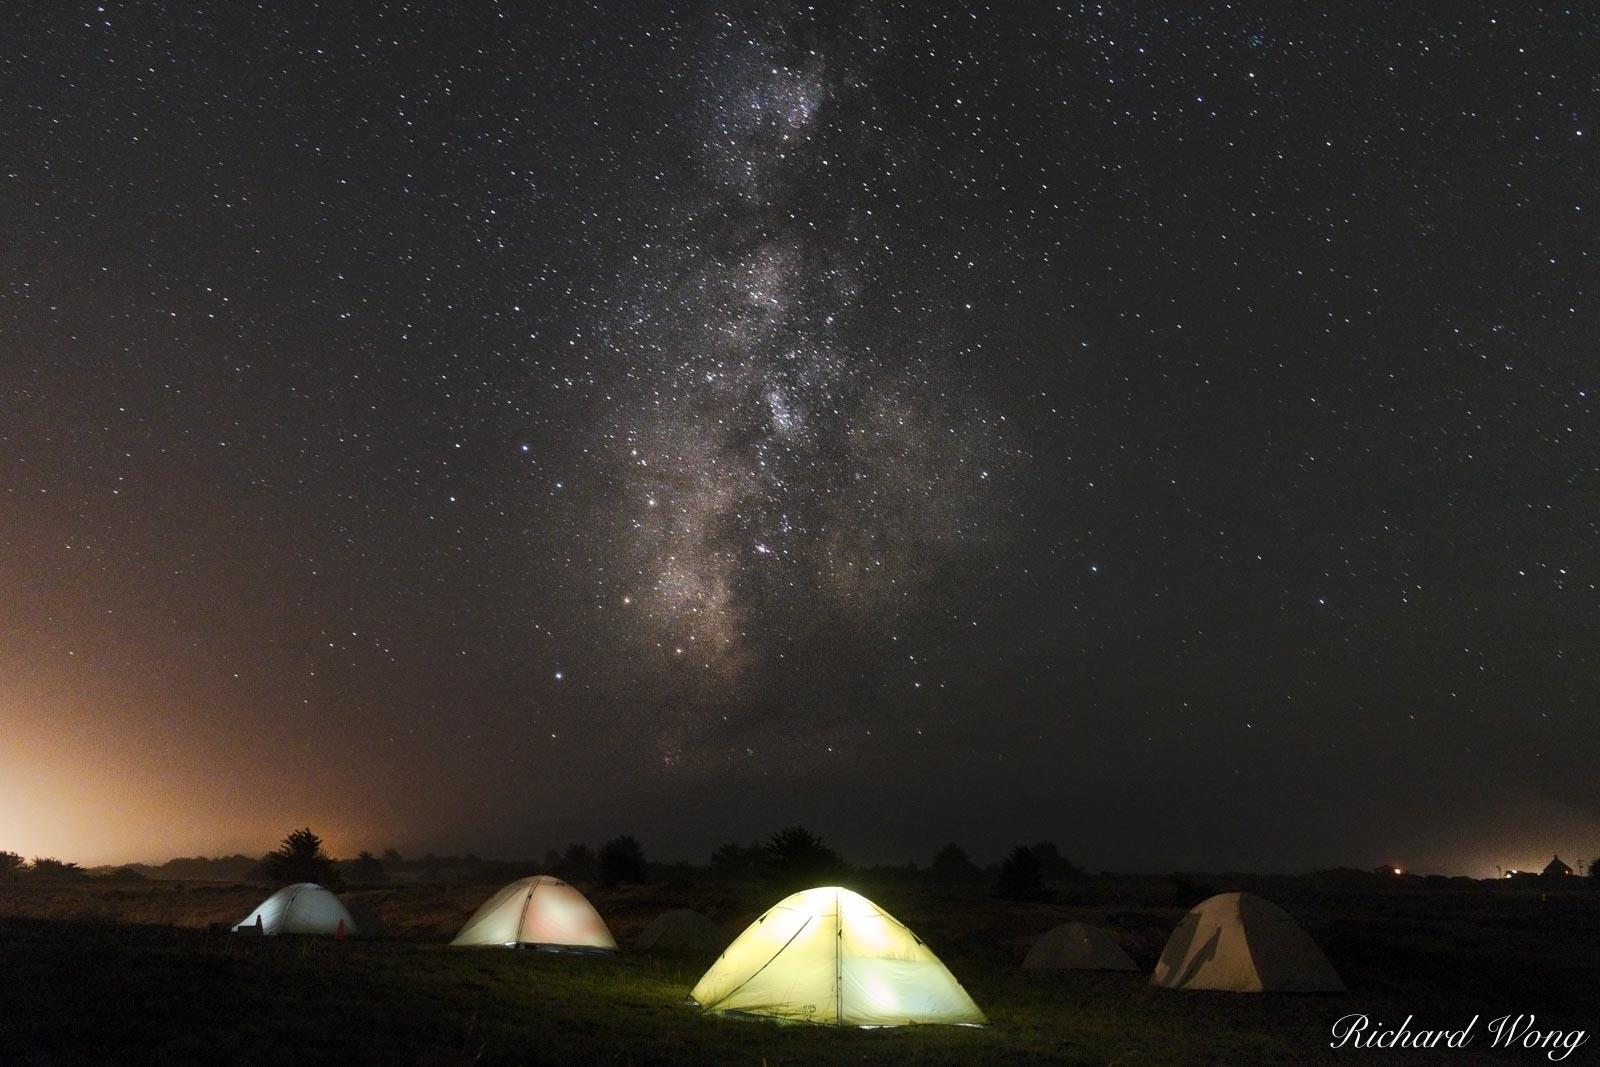 Backroads Camping Trip Tents Under the Milky Way Night Sky at Chanslor Ranch, Bodega Bay, California, photo, photo